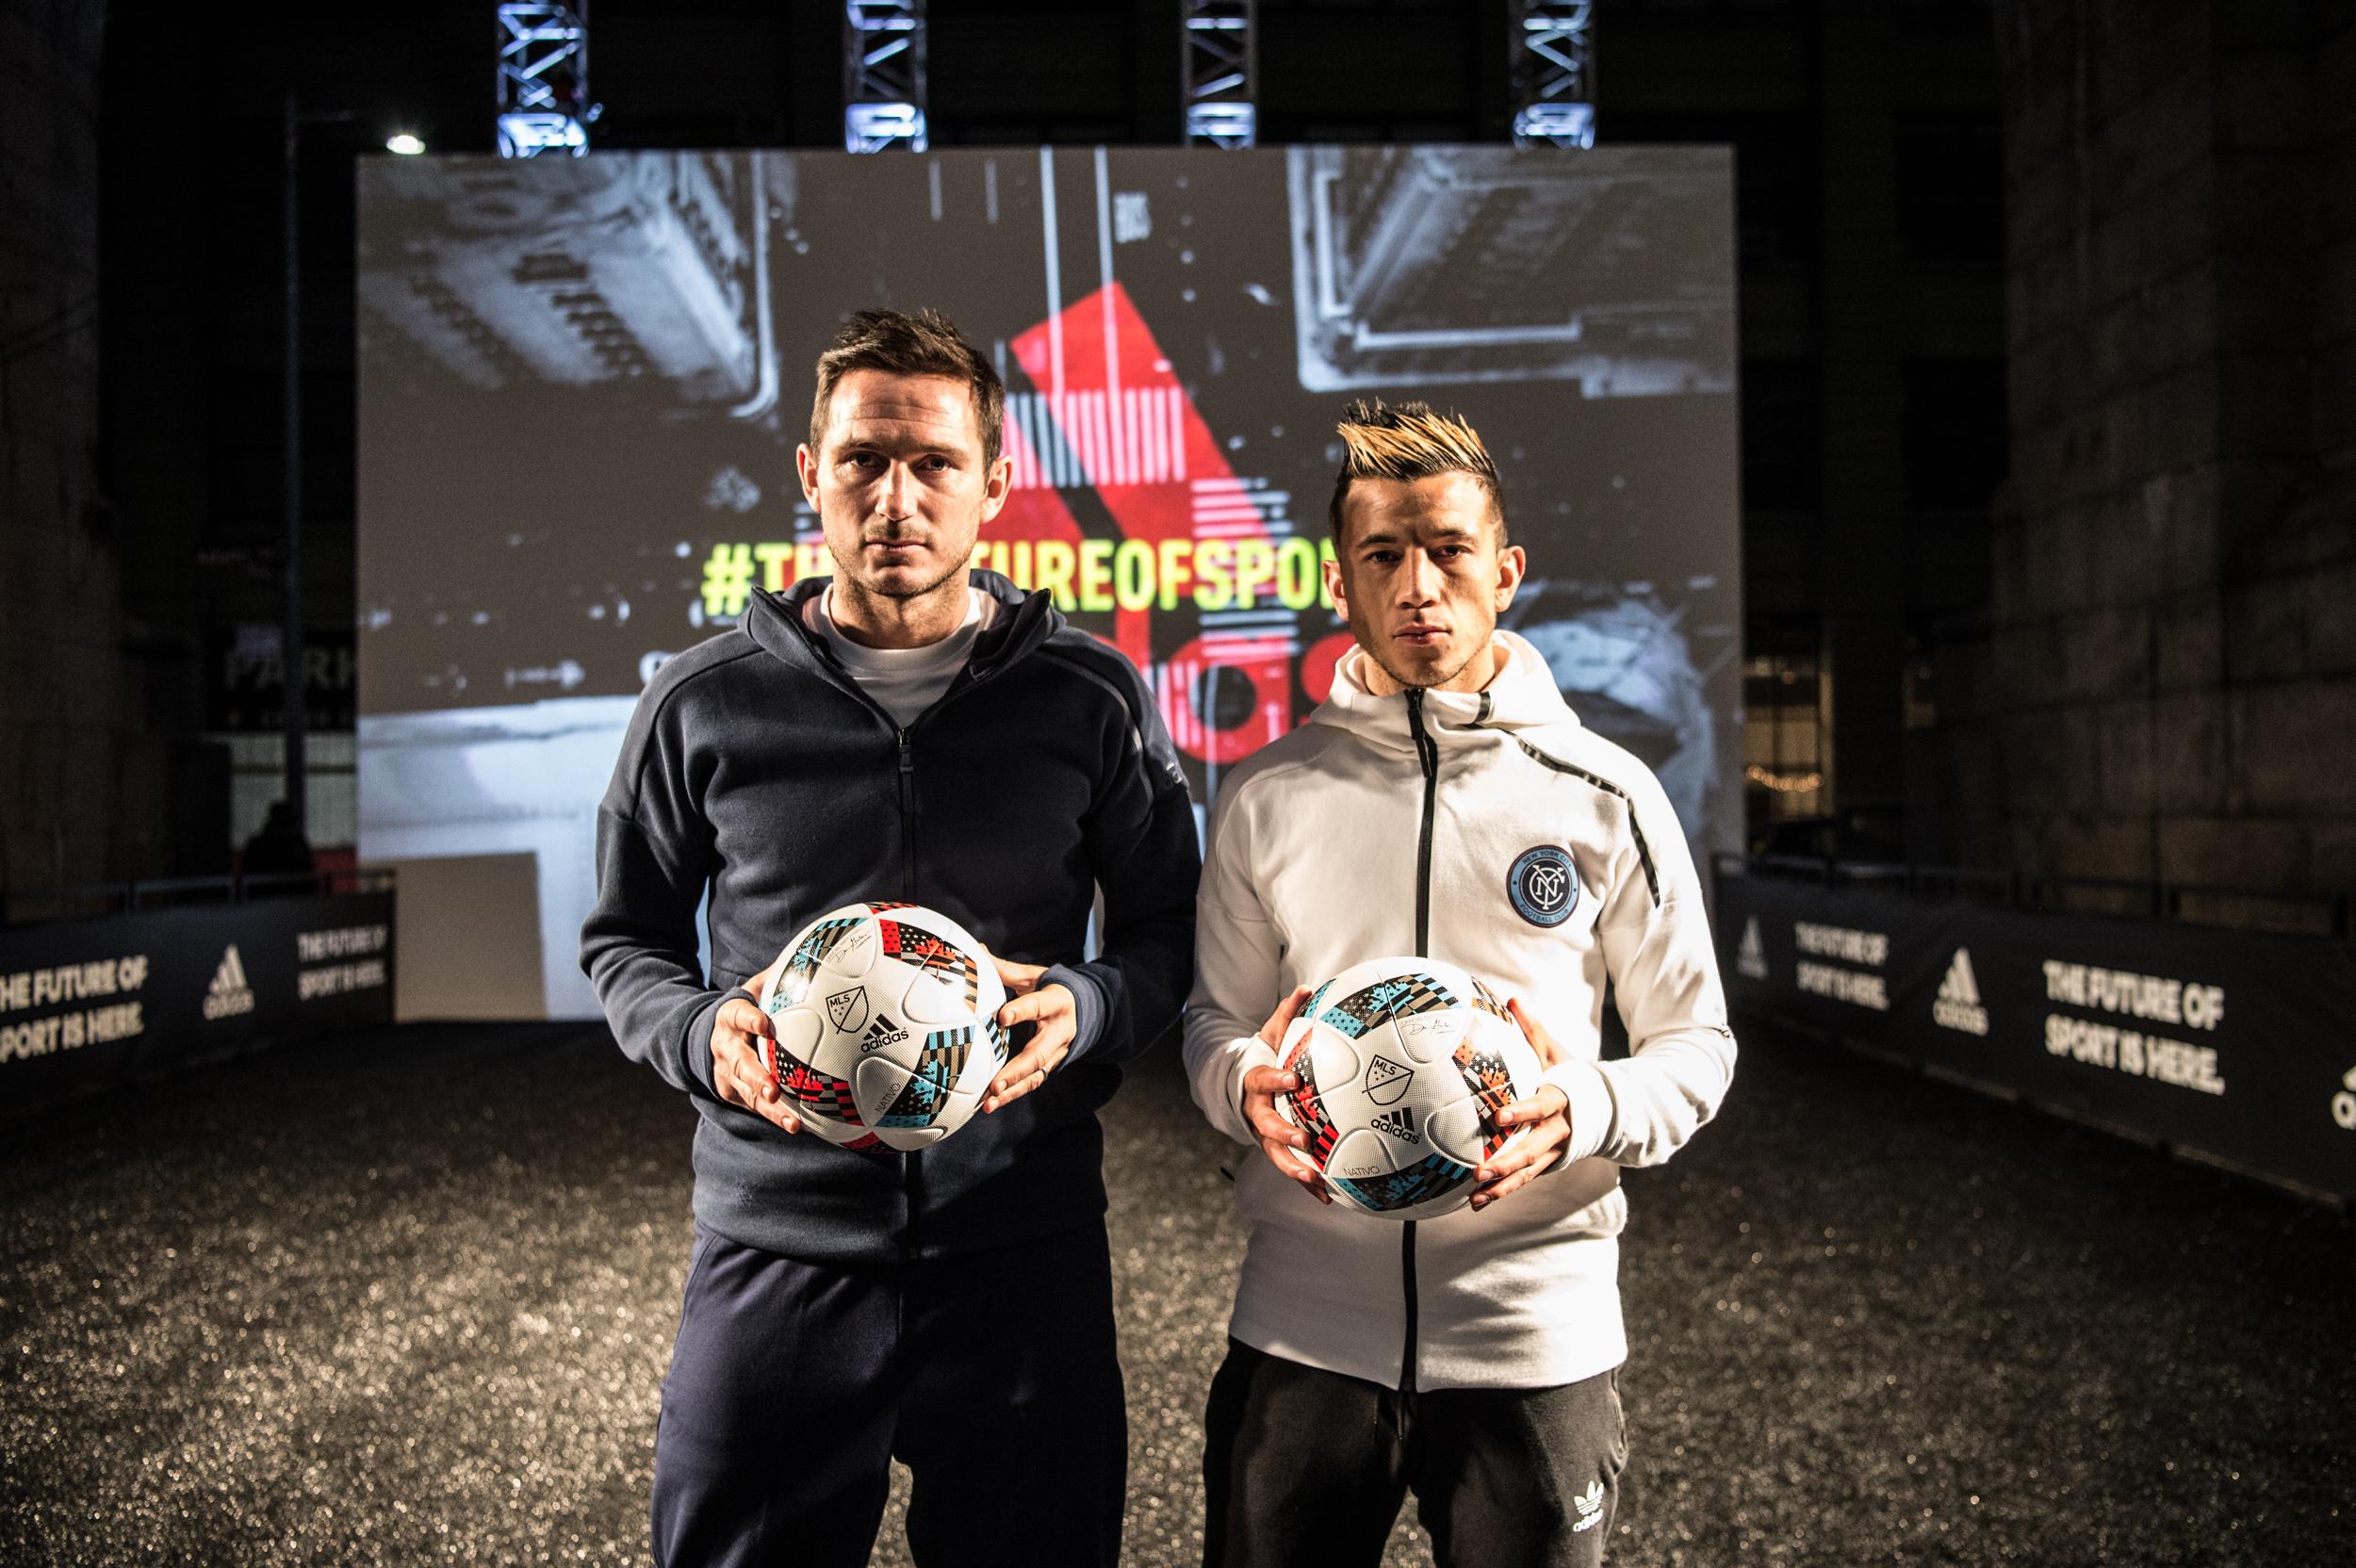 adidasFlagship_SoccerTargetPractice_(18_of_21).jpg